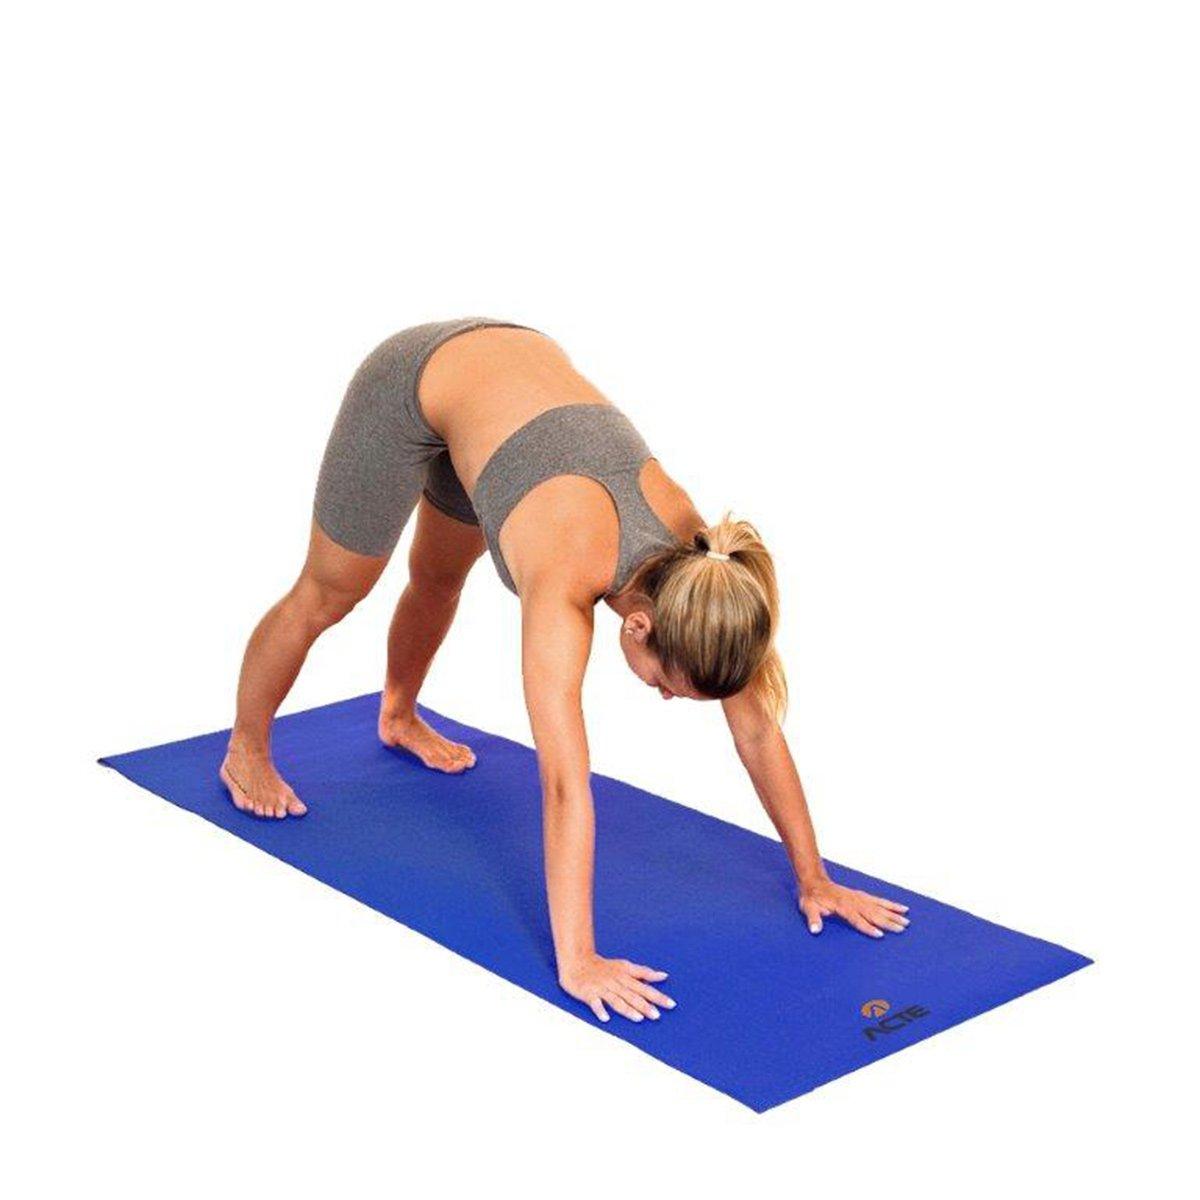 Tapete Acte Sports Yoga Mat - Compre Agora  d65f7b6fa176